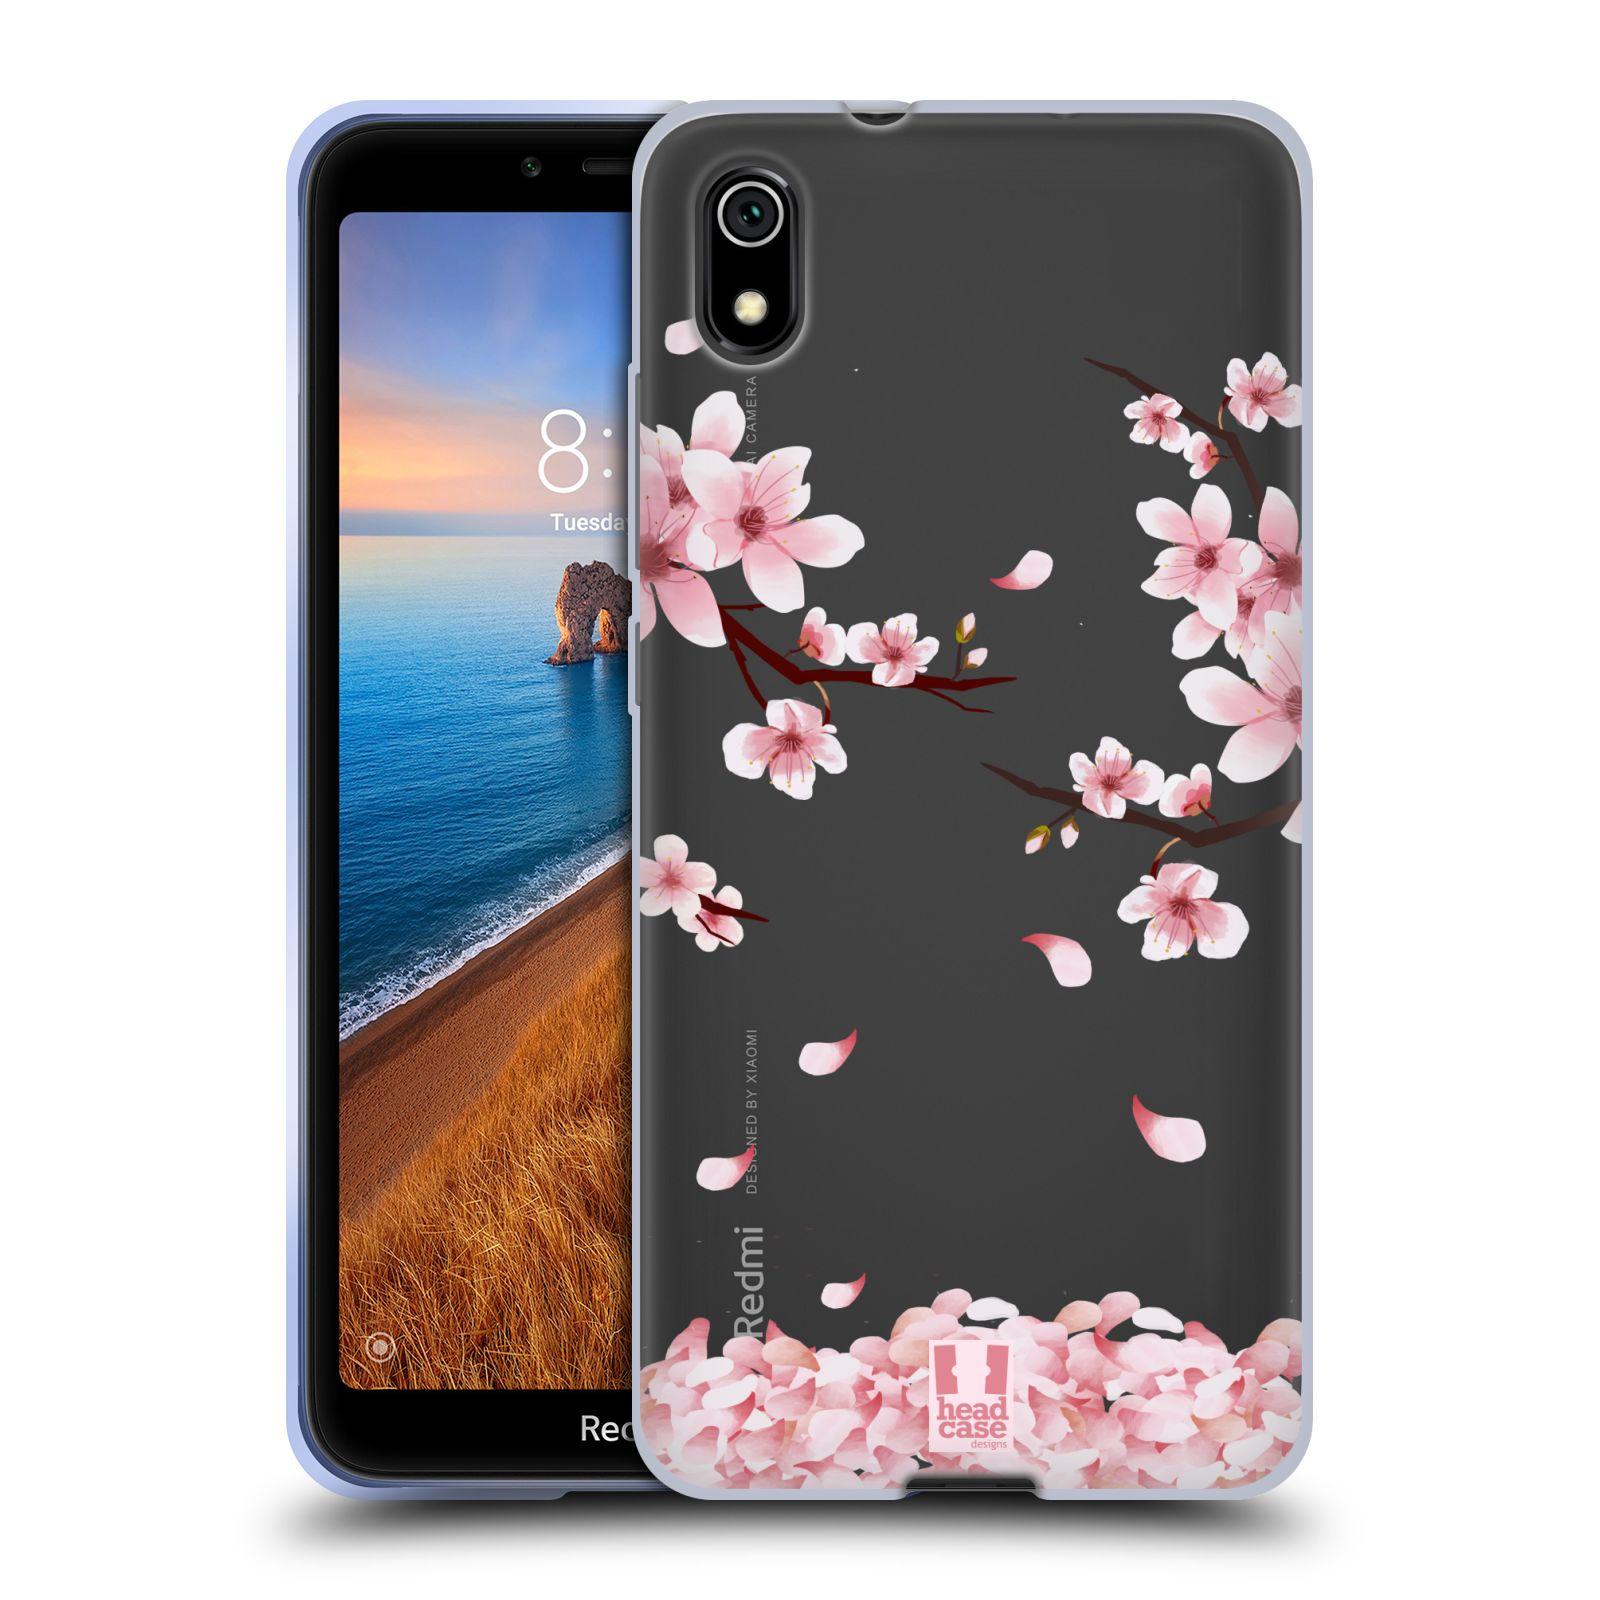 Silikonové pouzdro na mobil Redmi 7A - Head Case - Květy a větvičky